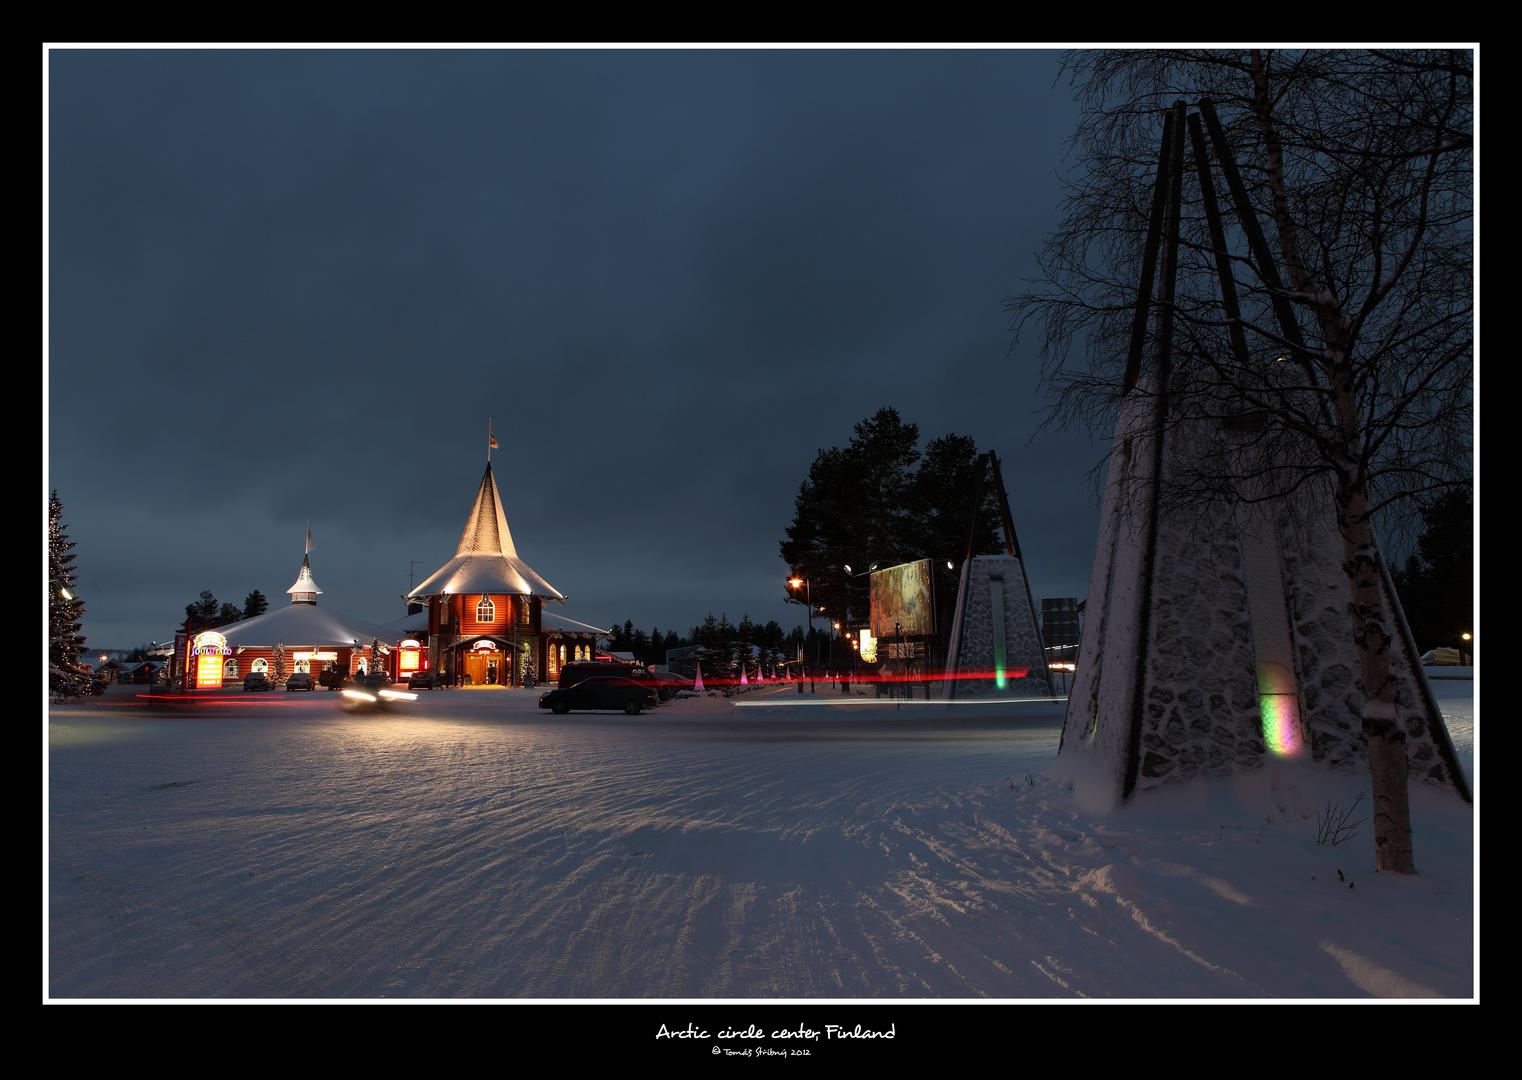 .:ARCTIC CIRCLE CENTER NAPAPIIRI:.